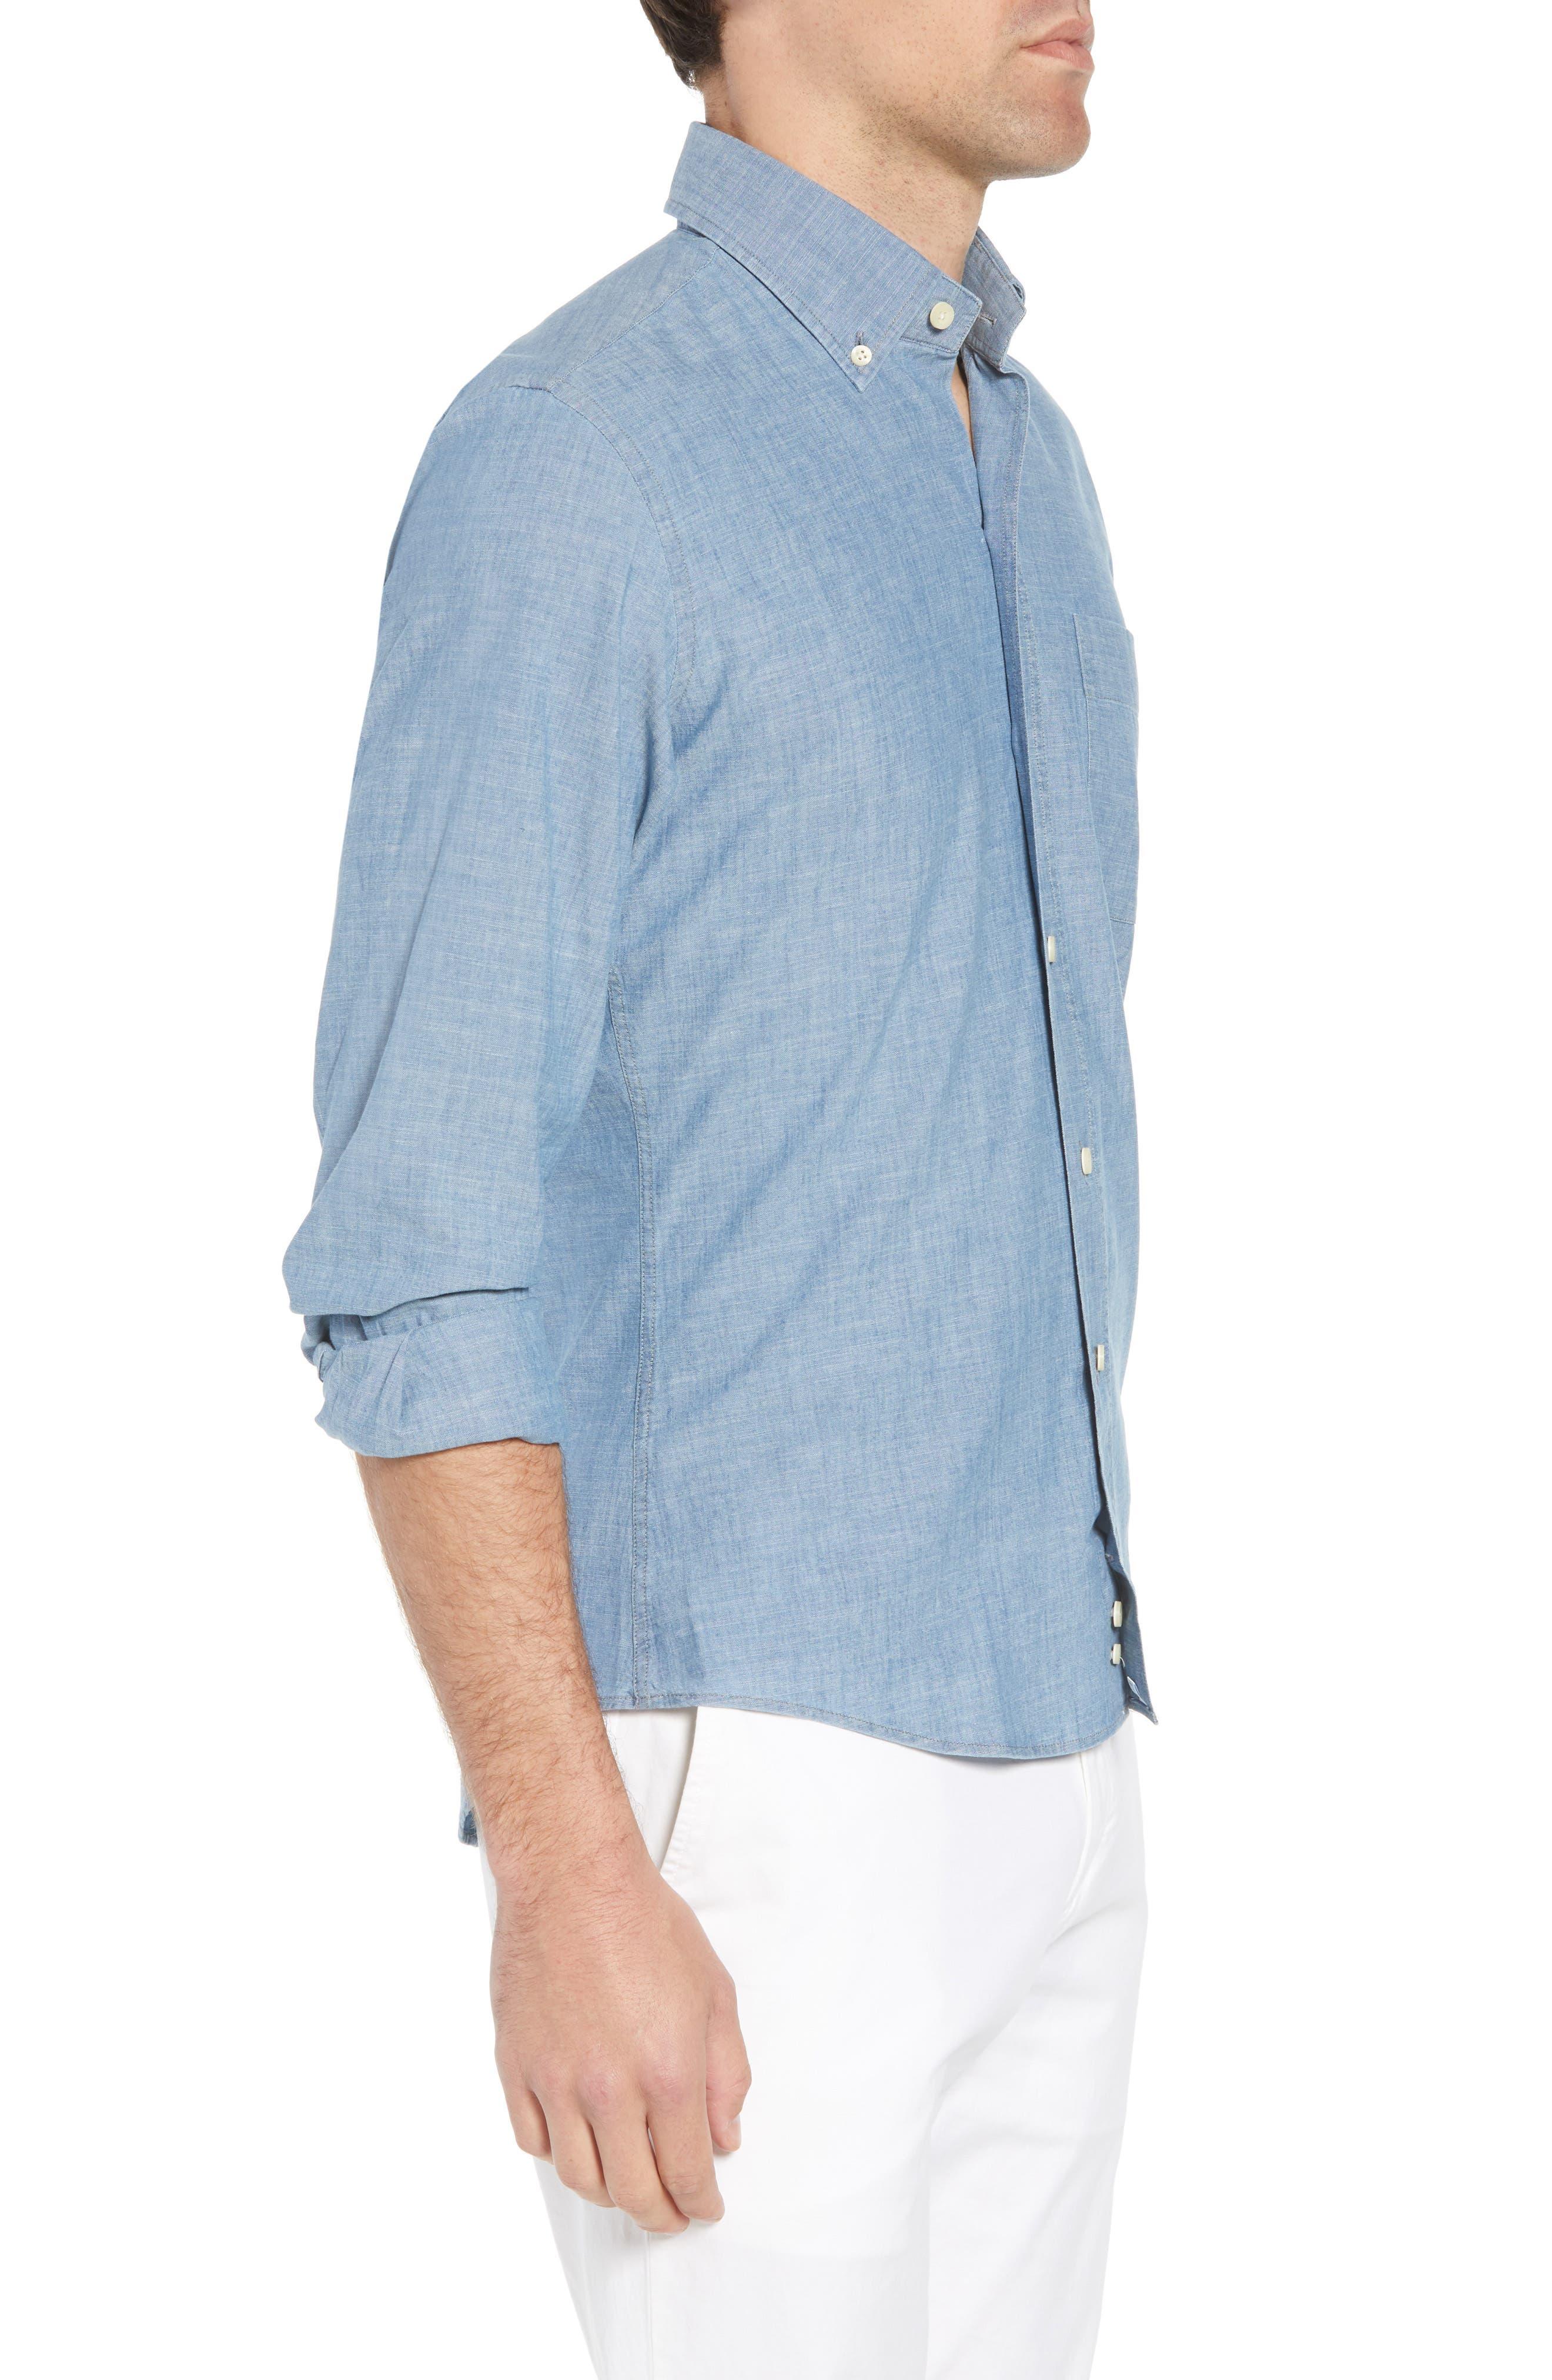 Ancroft Slim Fit Chambray Sport Shirt,                             Alternate thumbnail 3, color,                             400